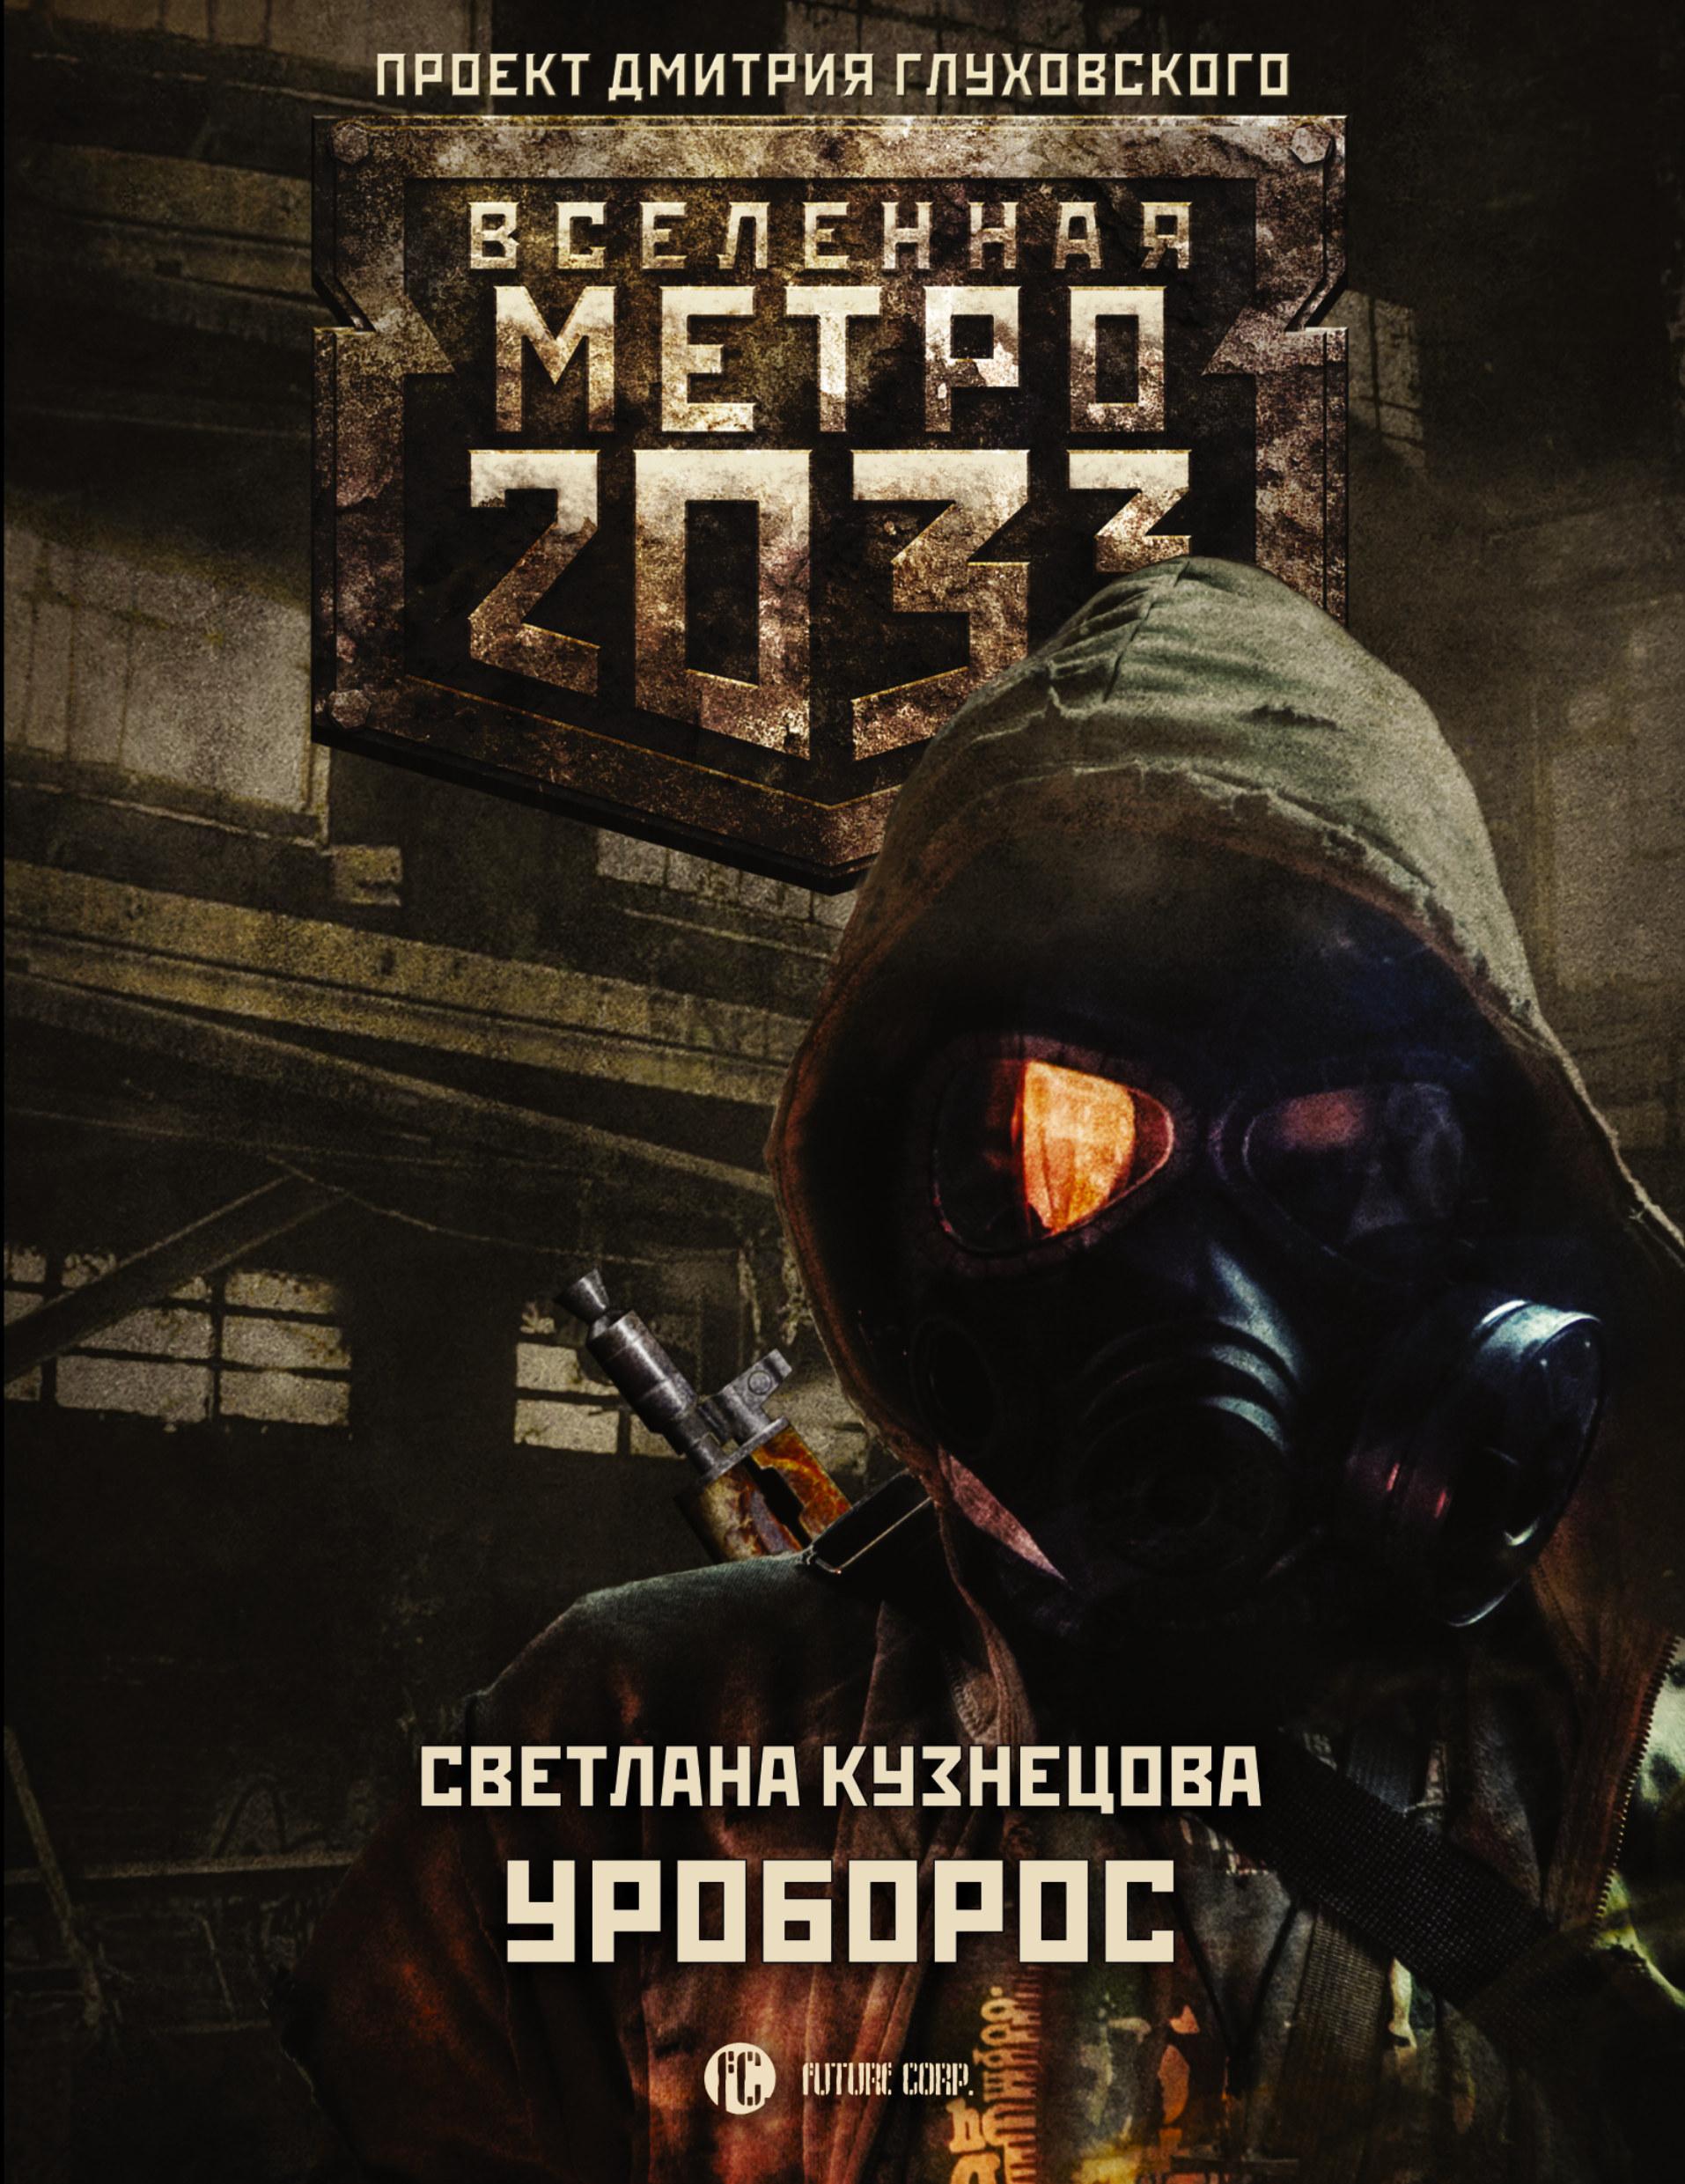 Светлана Кузнецова Метро 2033: Уроборос